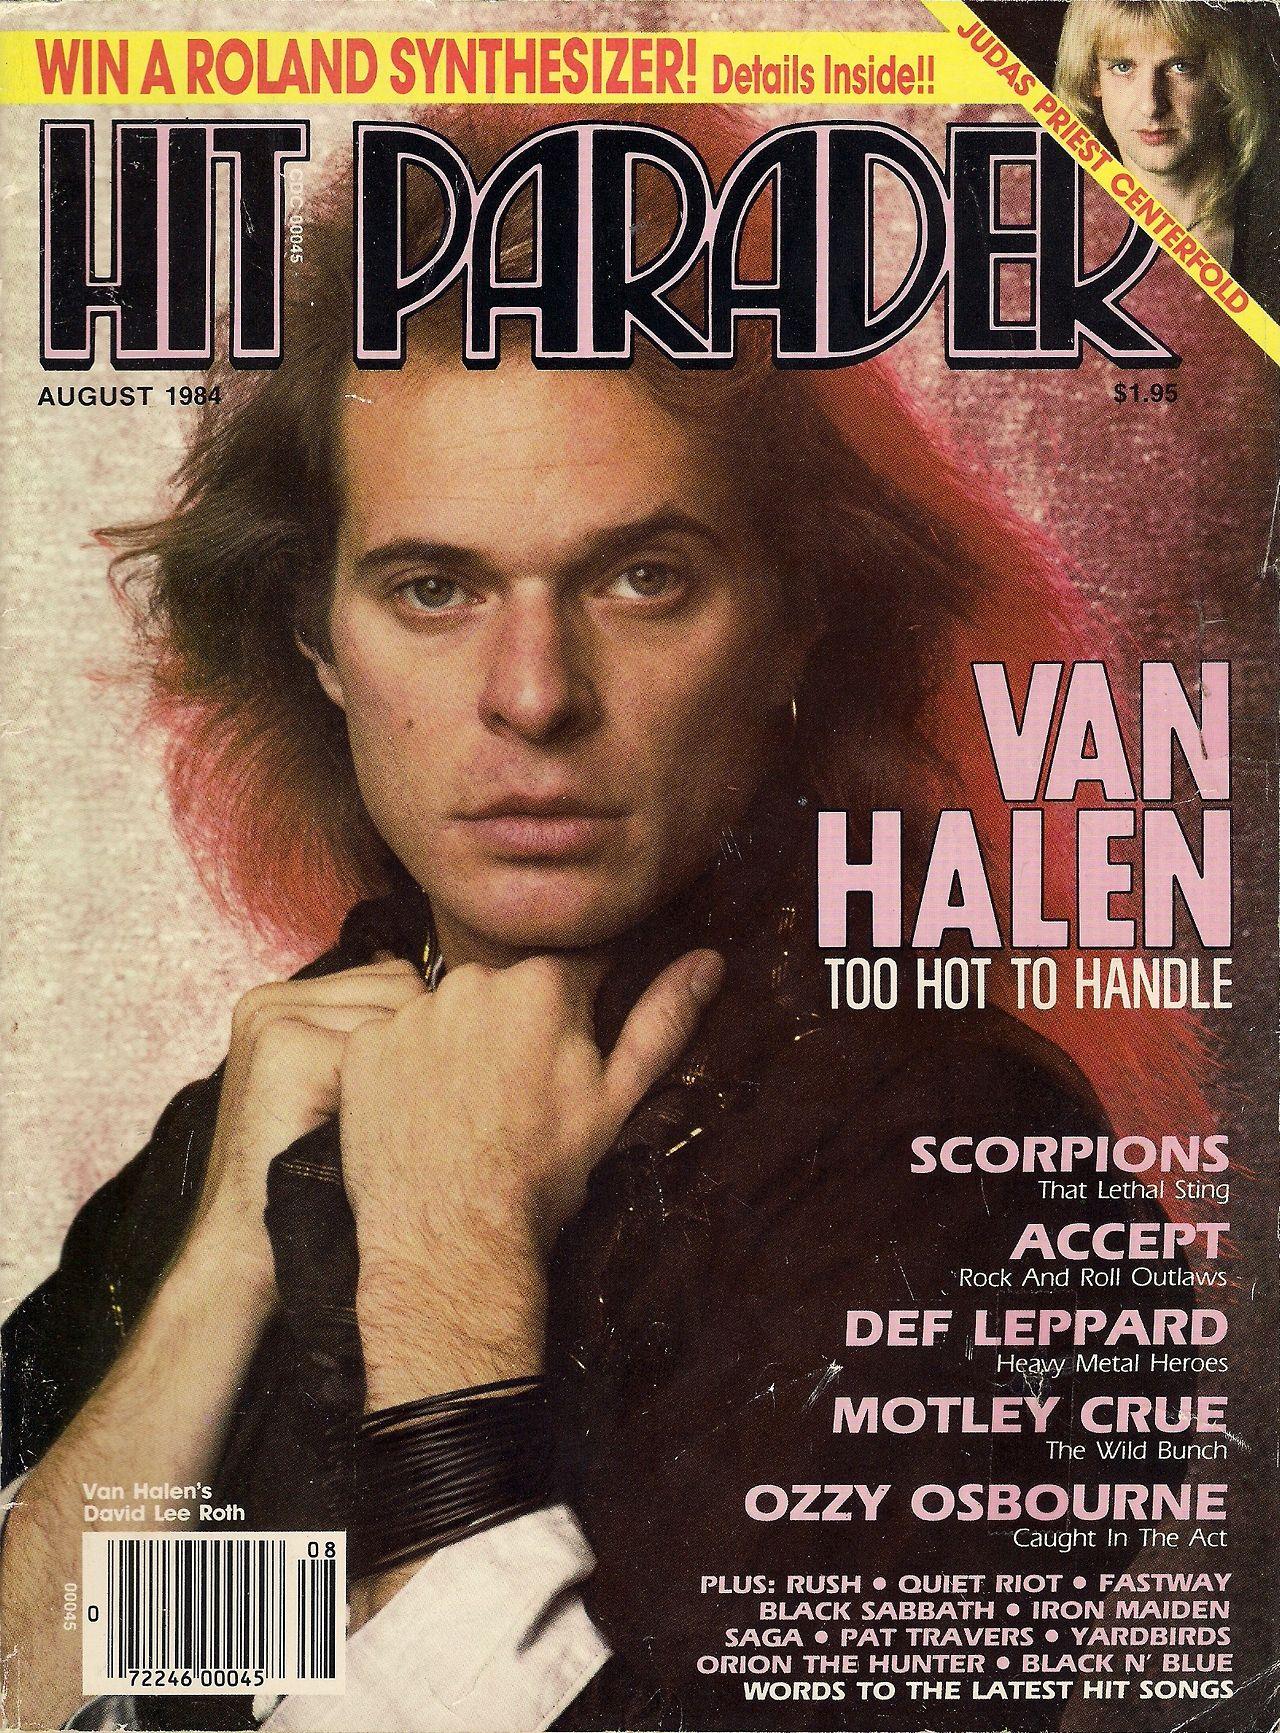 David Lee Roth Graces The Cover Of Hit Parader Magazine 1984 Van Halen David Lee Roth Hard Rock